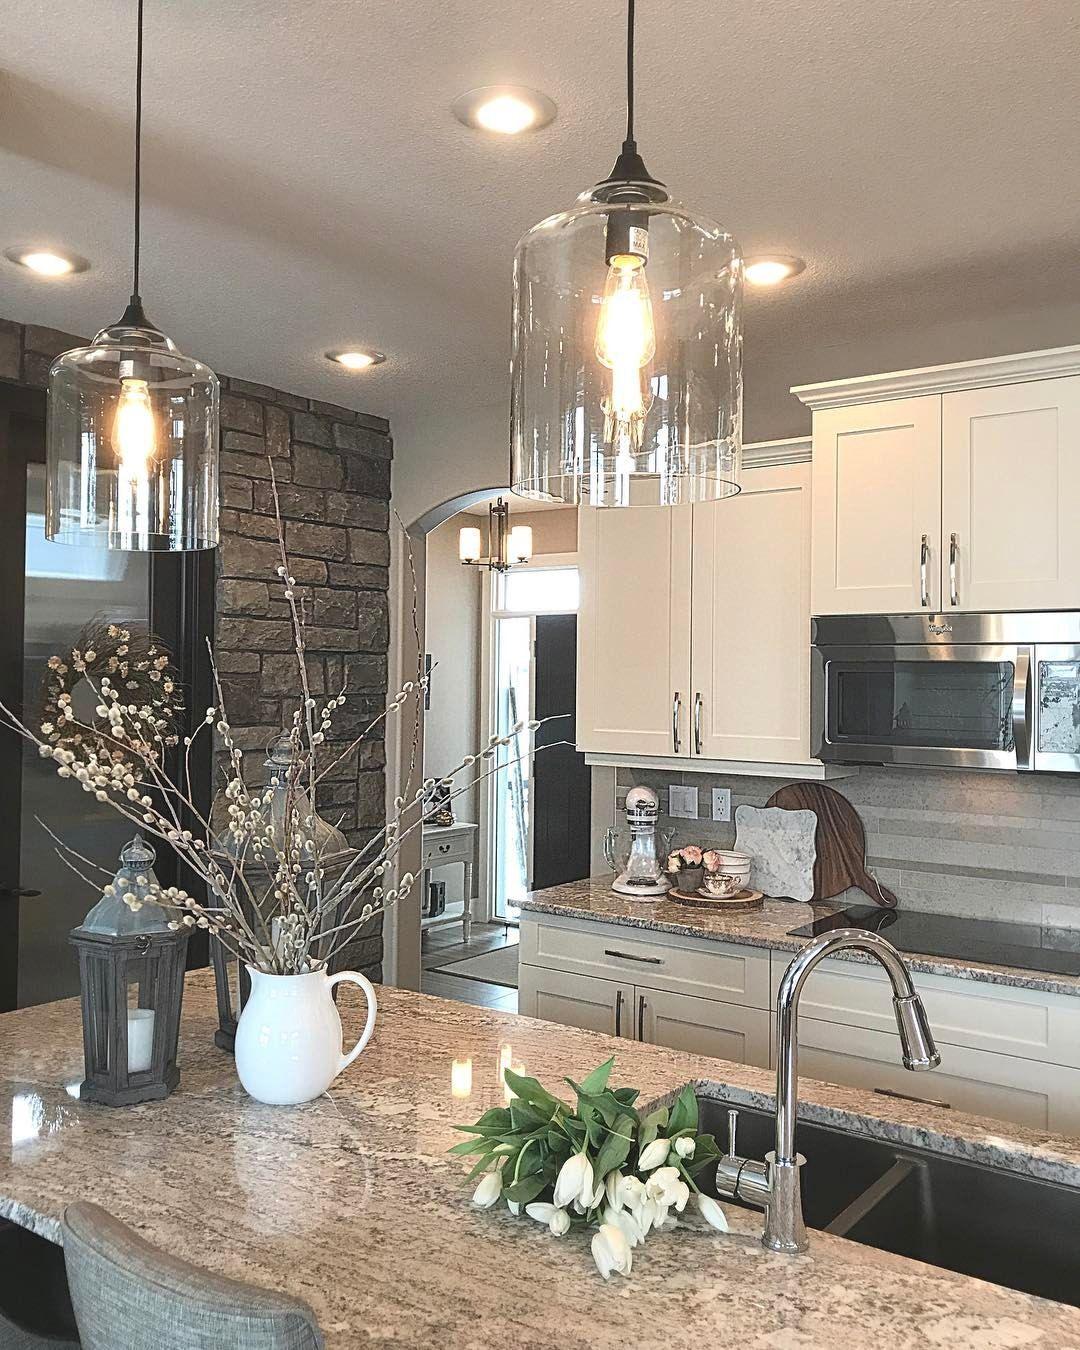 20 Unique Kitchen Lighting Ideas for Your Wonderful ...